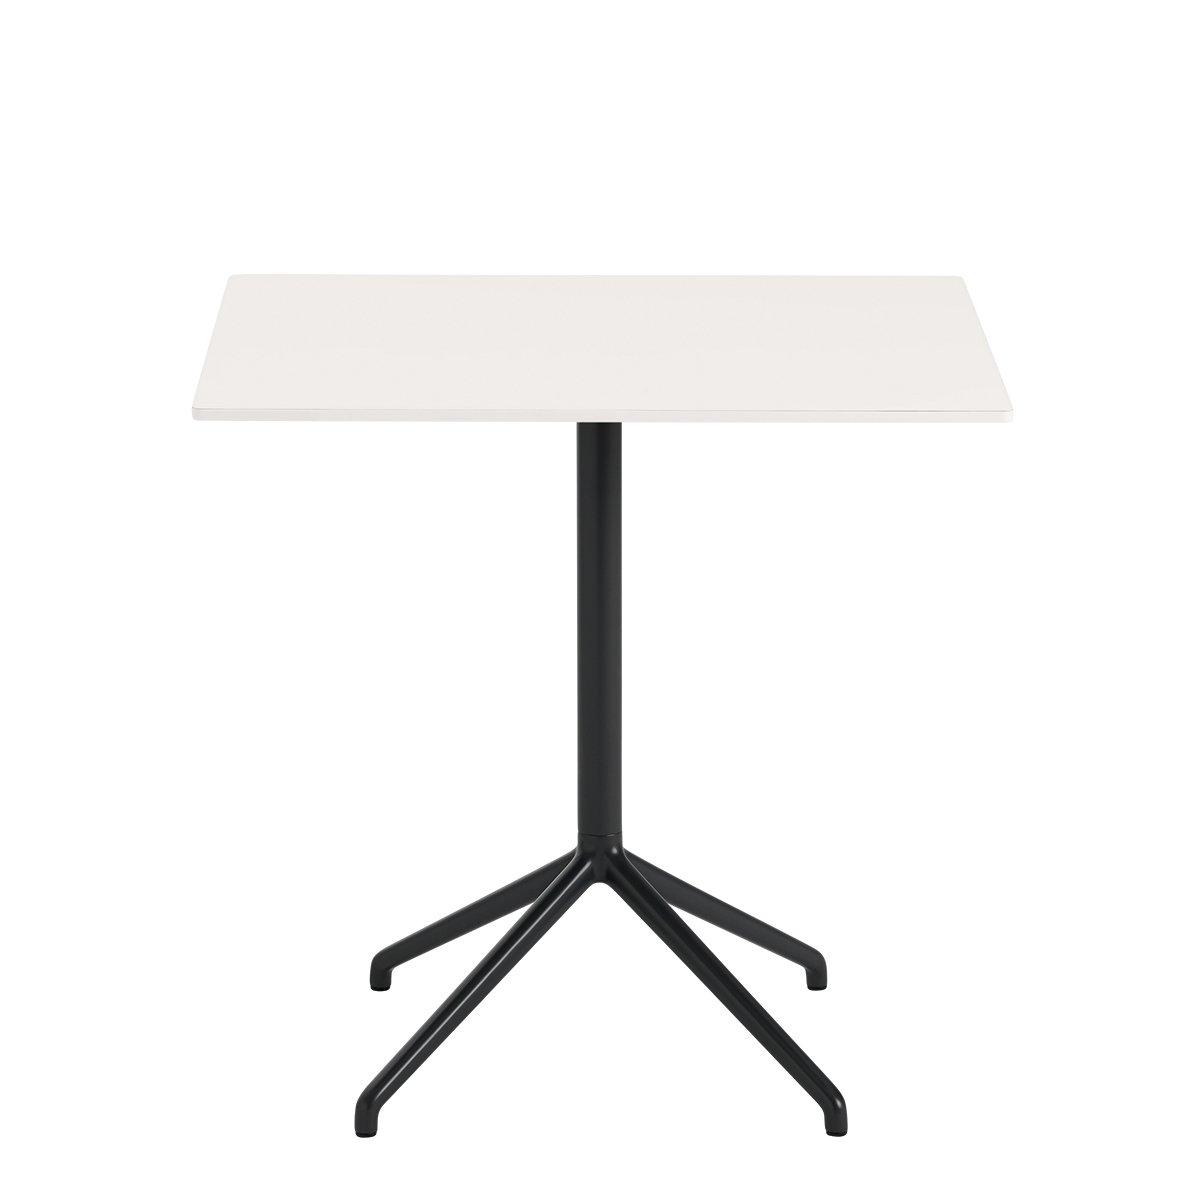 Muuto Still Caf� Tafel Rechthoekig Wit - Zwart - Hoogte: 73 cm.